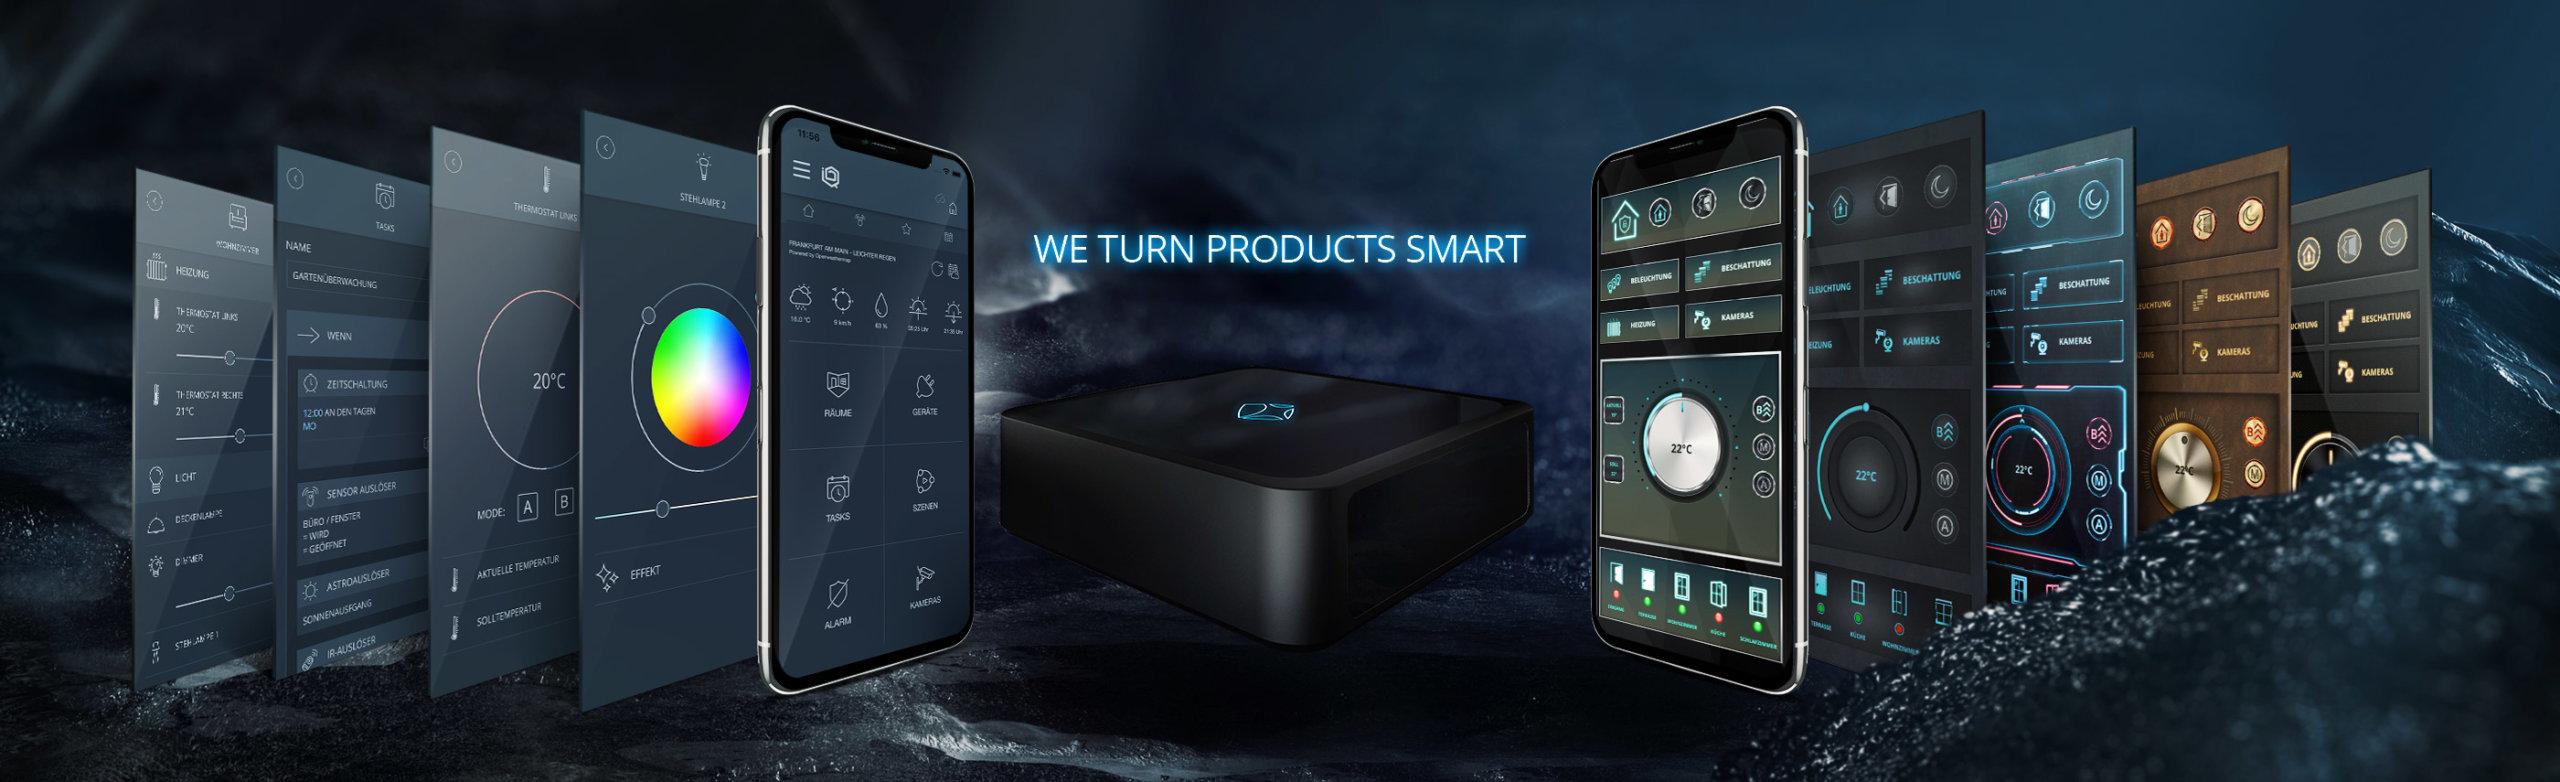 Wir machen Produkte Smart - mediola - AIO Gateway mit IQNOTROL NEO / IPQONTROL NEO & AIO CREATOR NEO / AIO REMOTE NEO